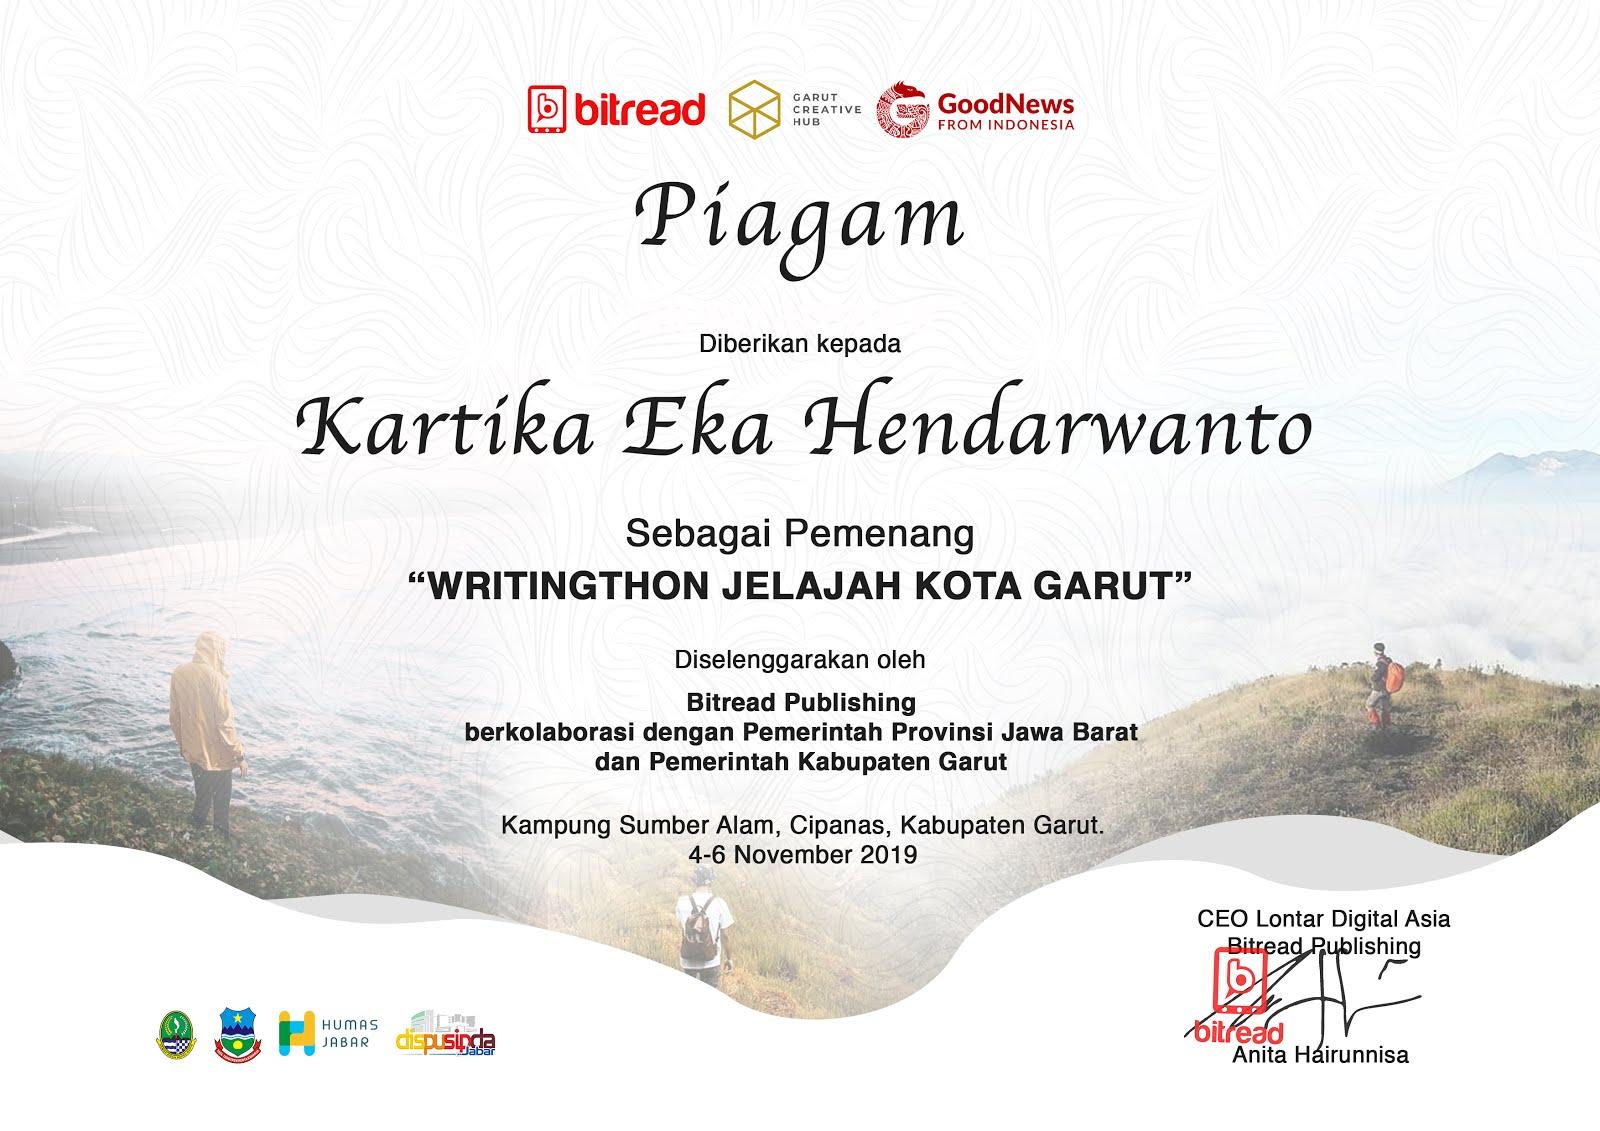 Writingthon Jelajah Kota Garut 2019